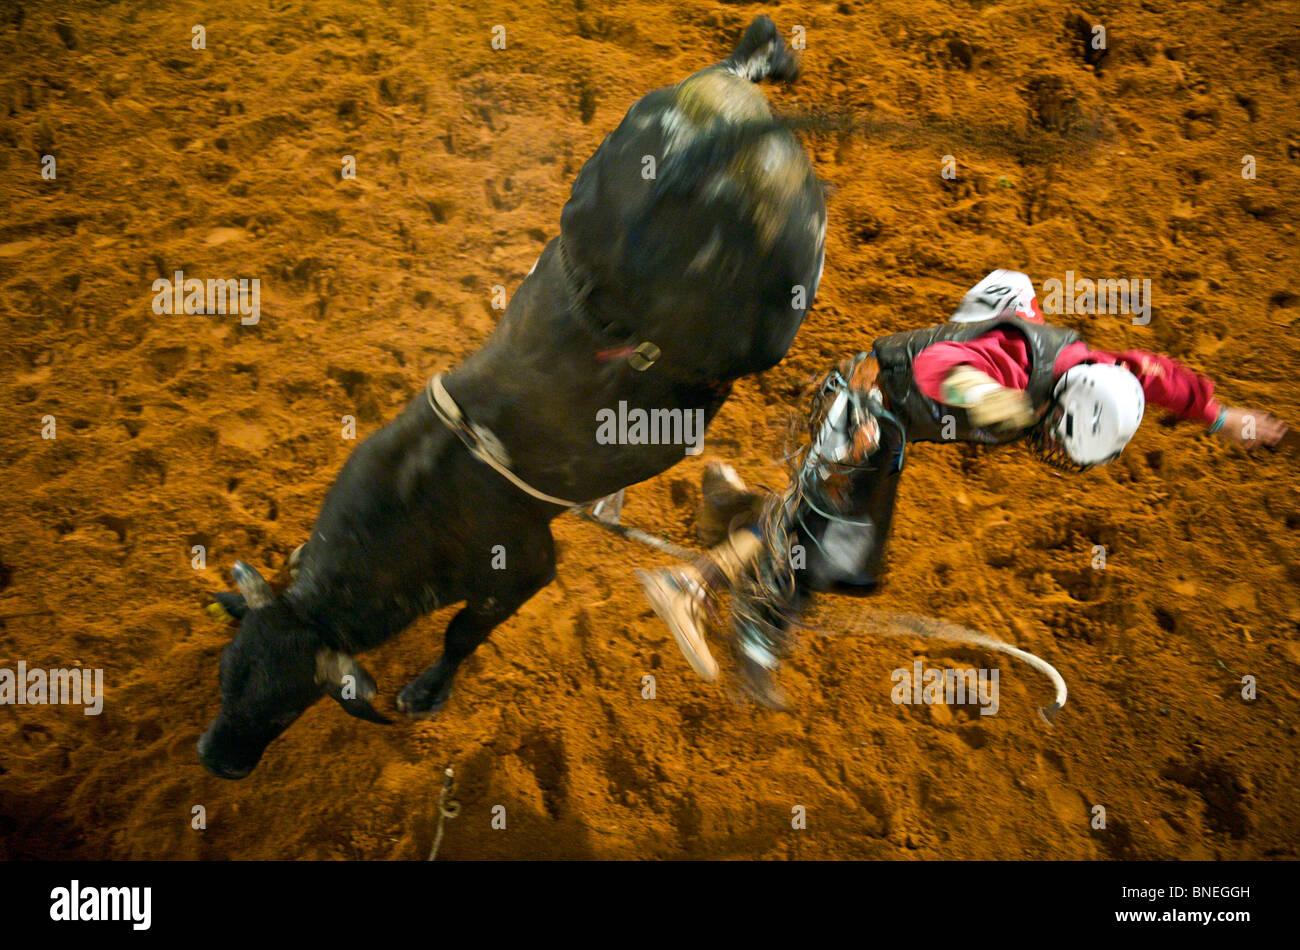 Miembro de rodeo PRCA saltando de Bull en Smalltown en Bridgeport Texas, EE.UU. Foto de stock